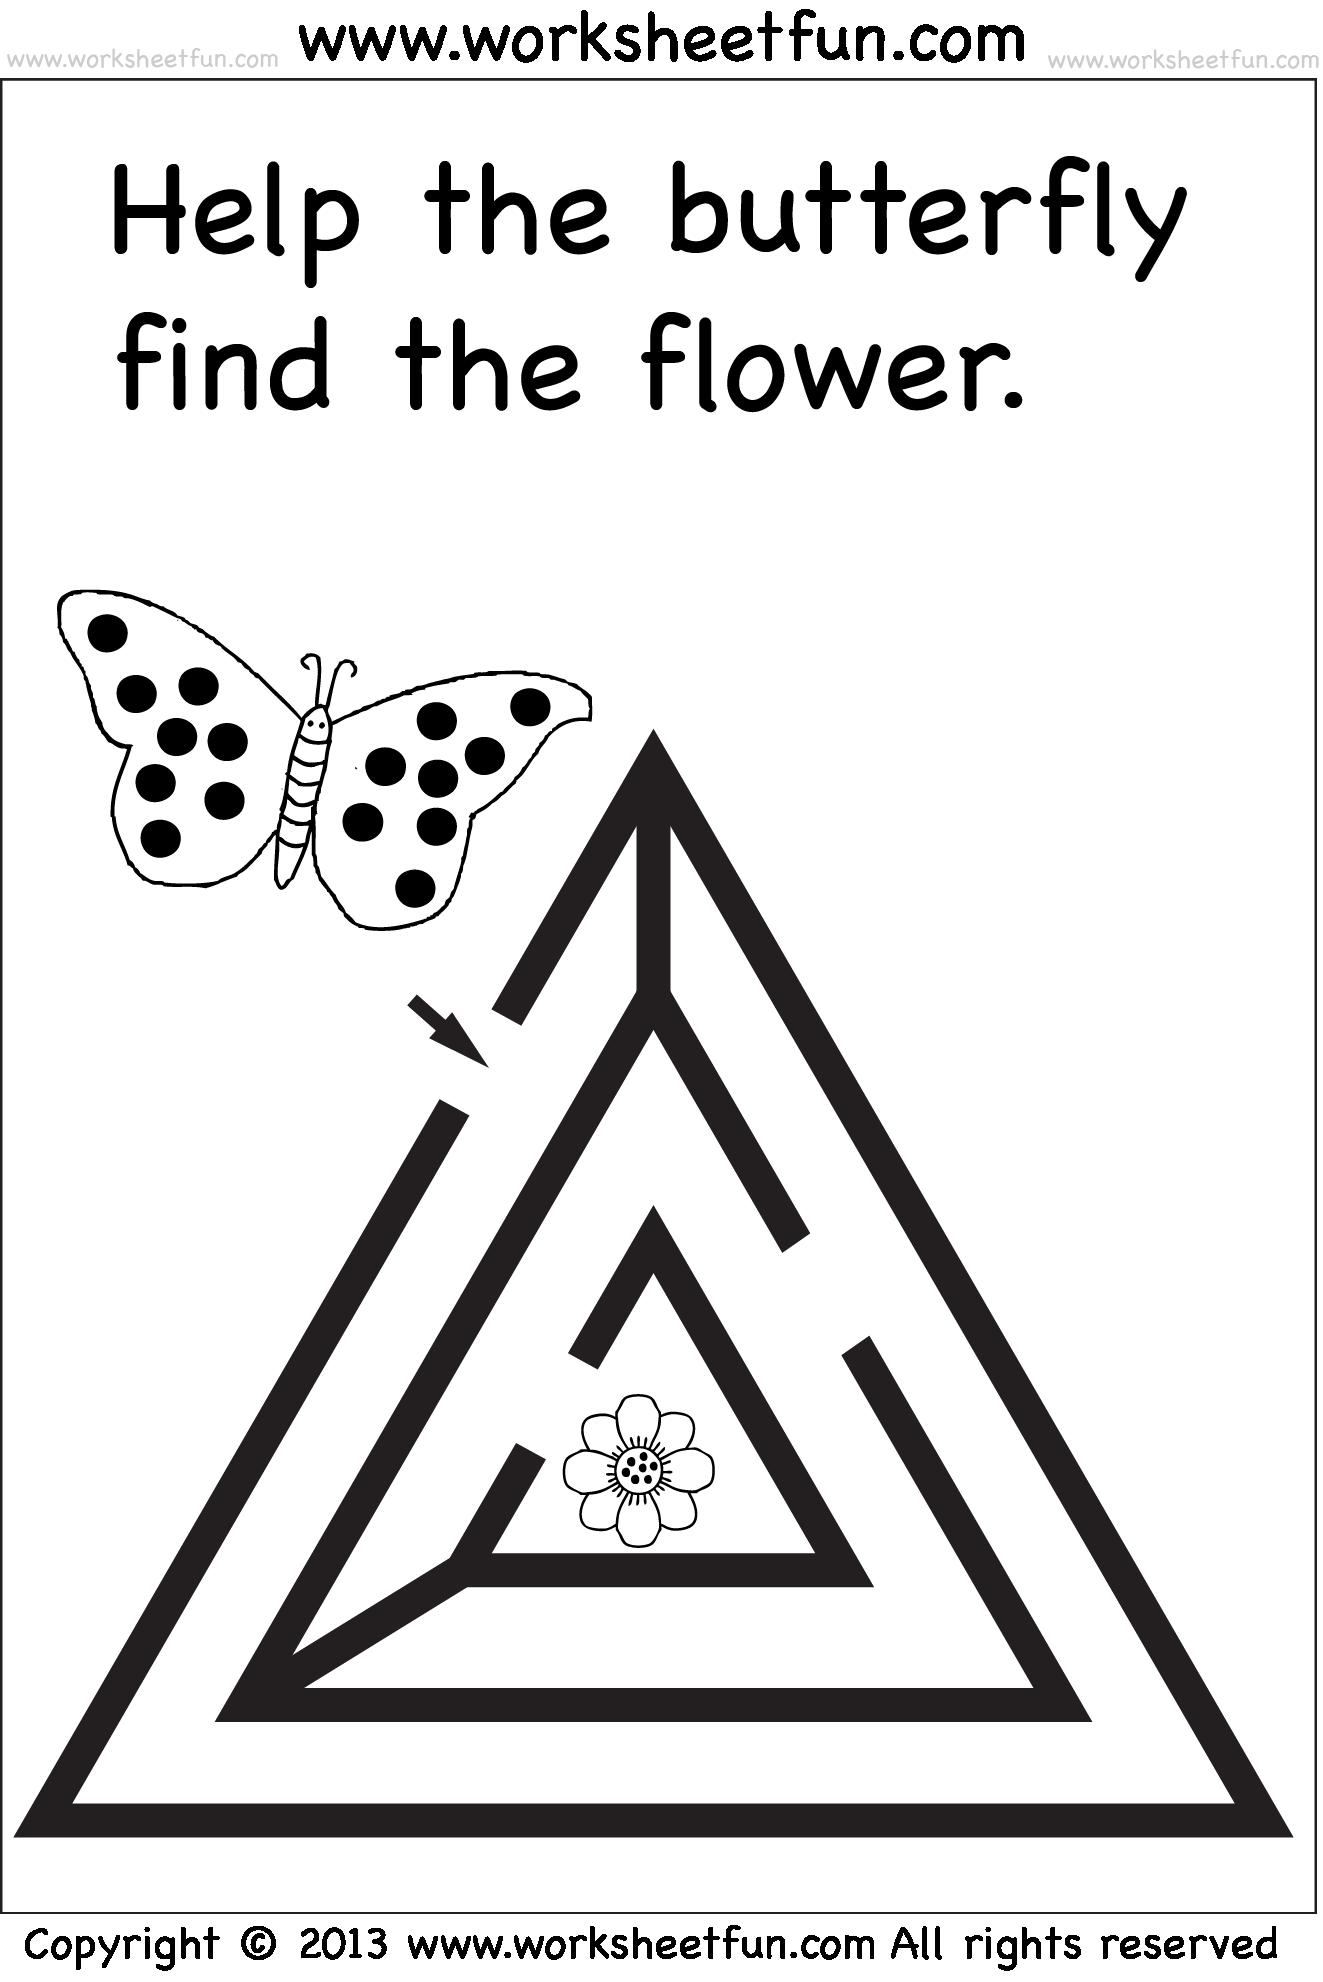 Most Popular Worksheets FREE Printable Worksheets Worksheetfun – Free Printable Worksheets for Preschool and Kindergarten